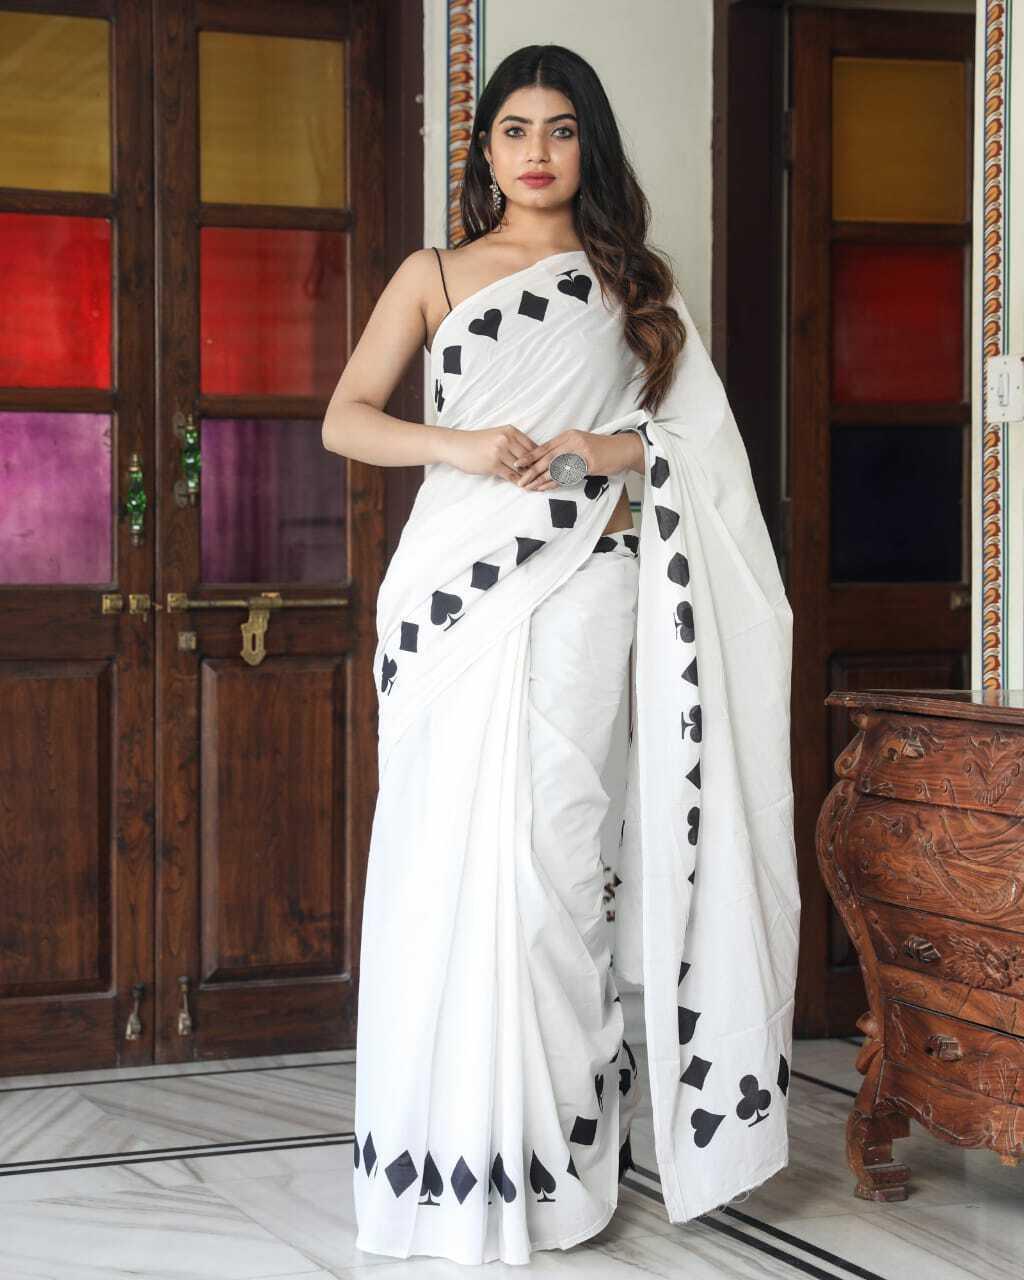 Designer Handmade Handloom Block Printed Cotton Saree For Women & Blouse Piece